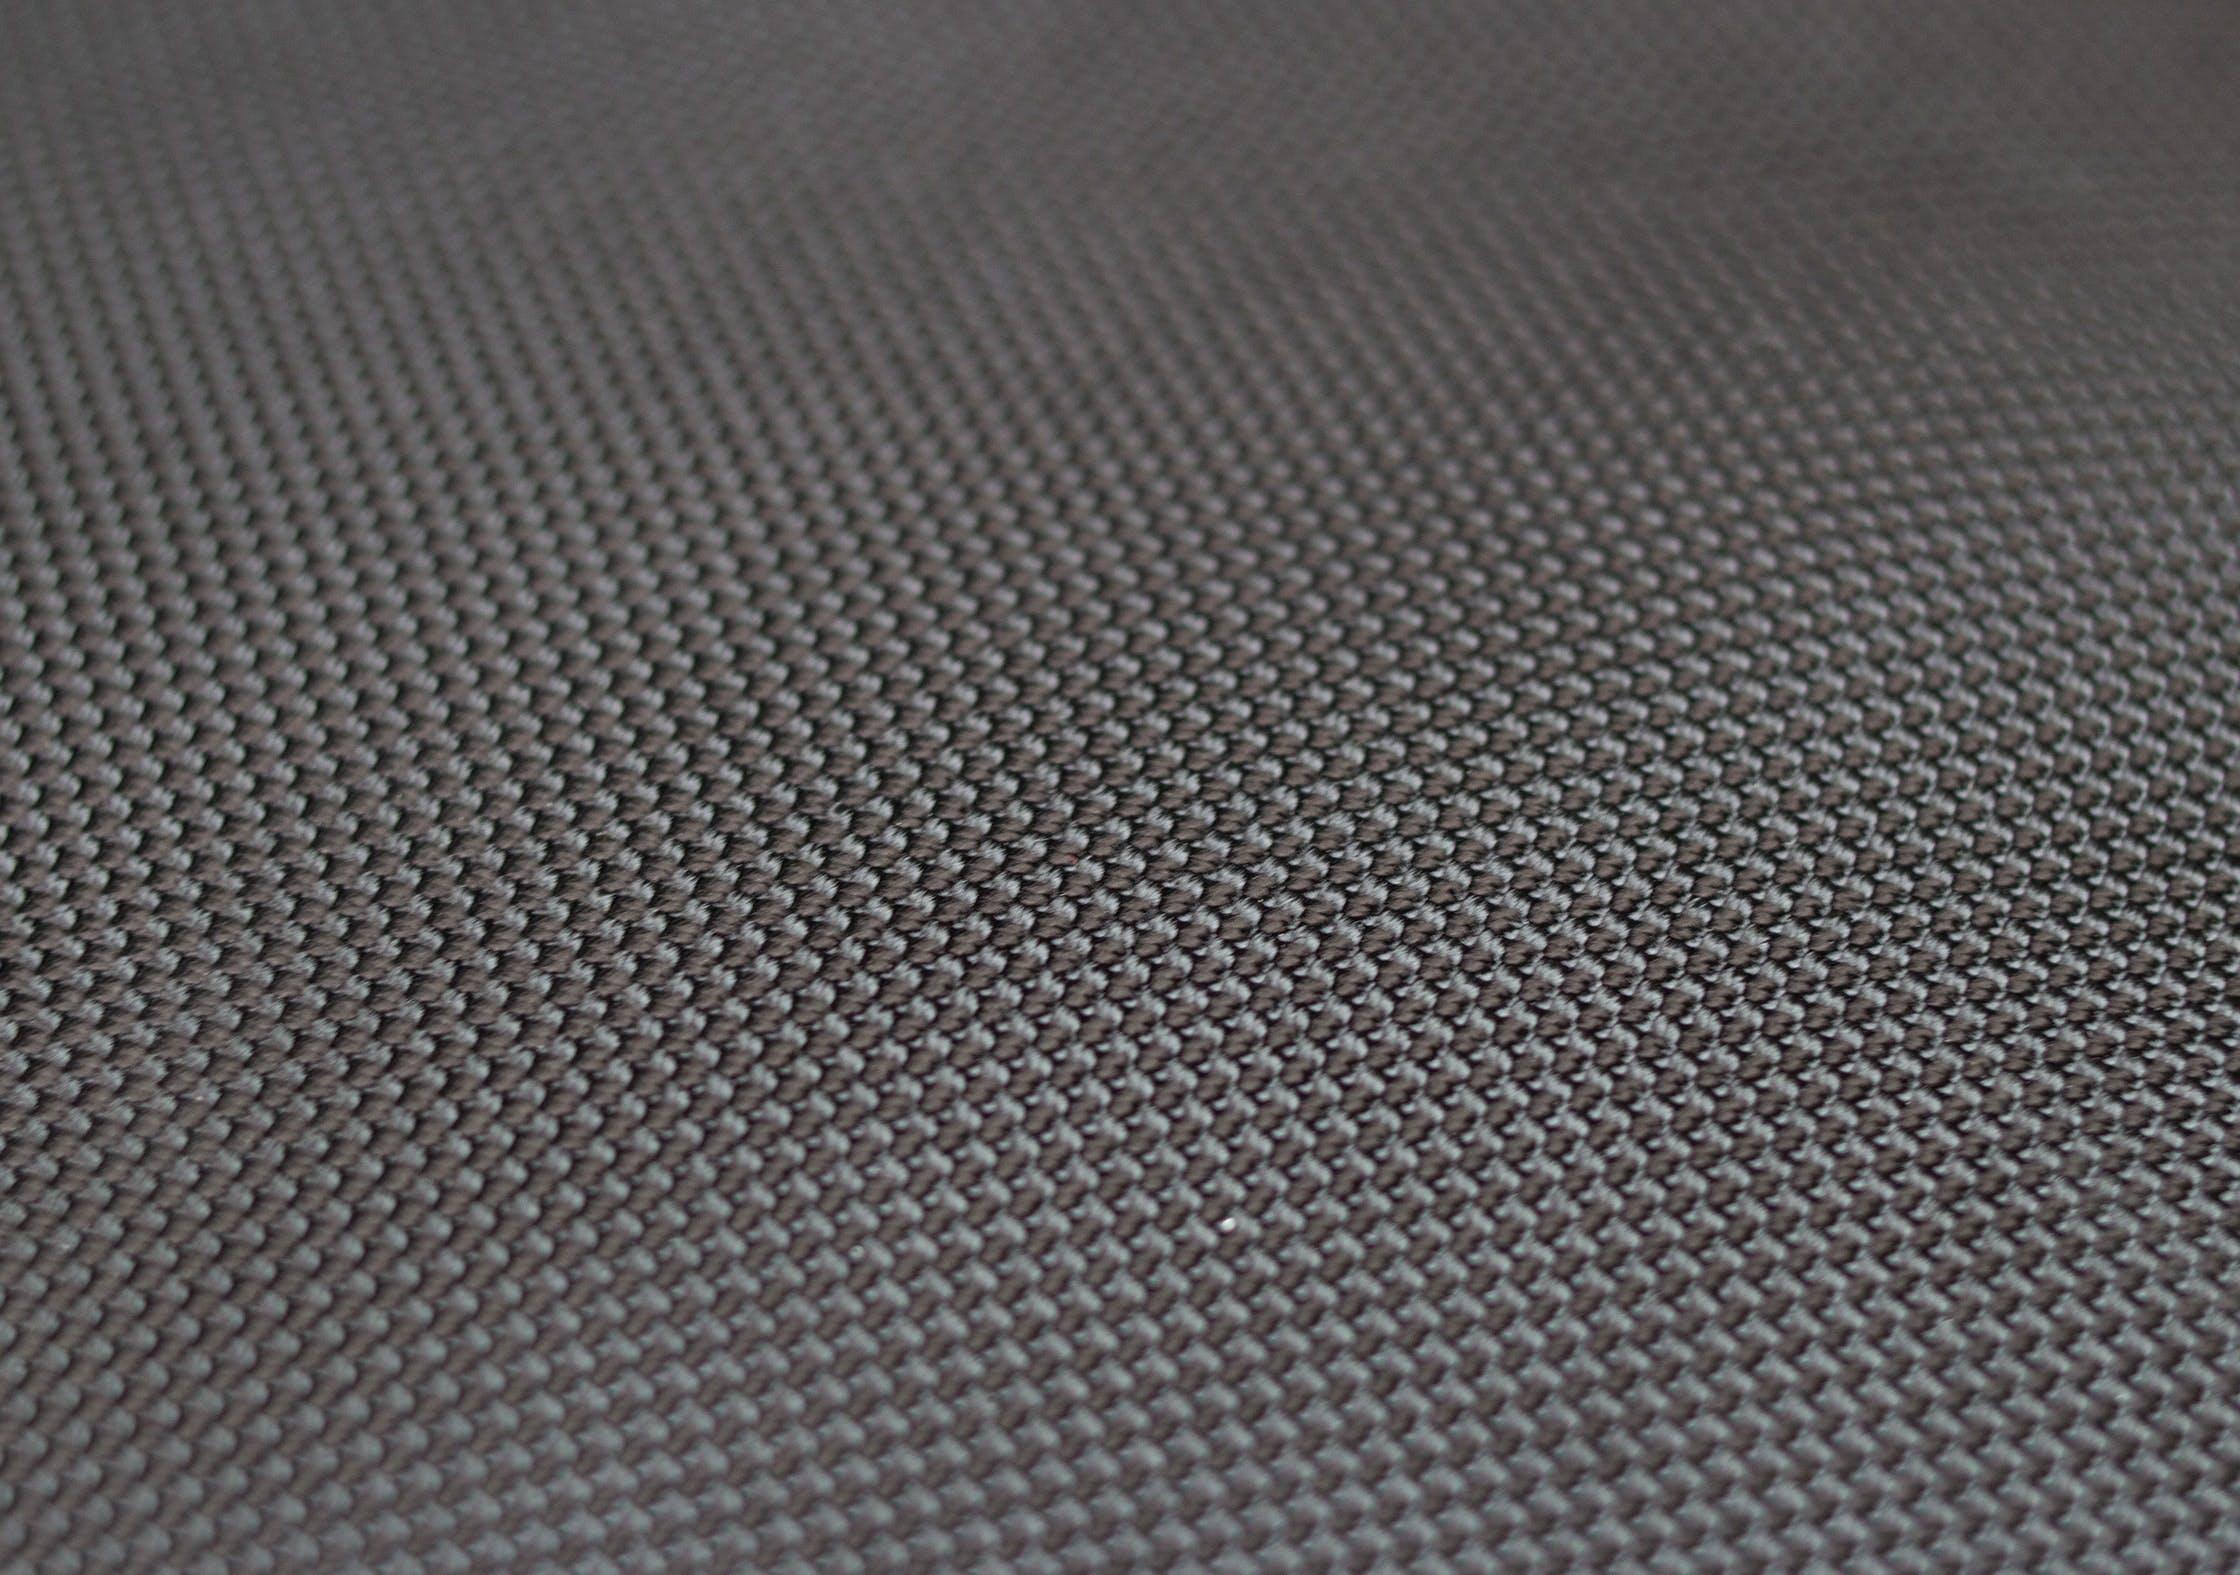 Aer Flight Pack 2 Fabric